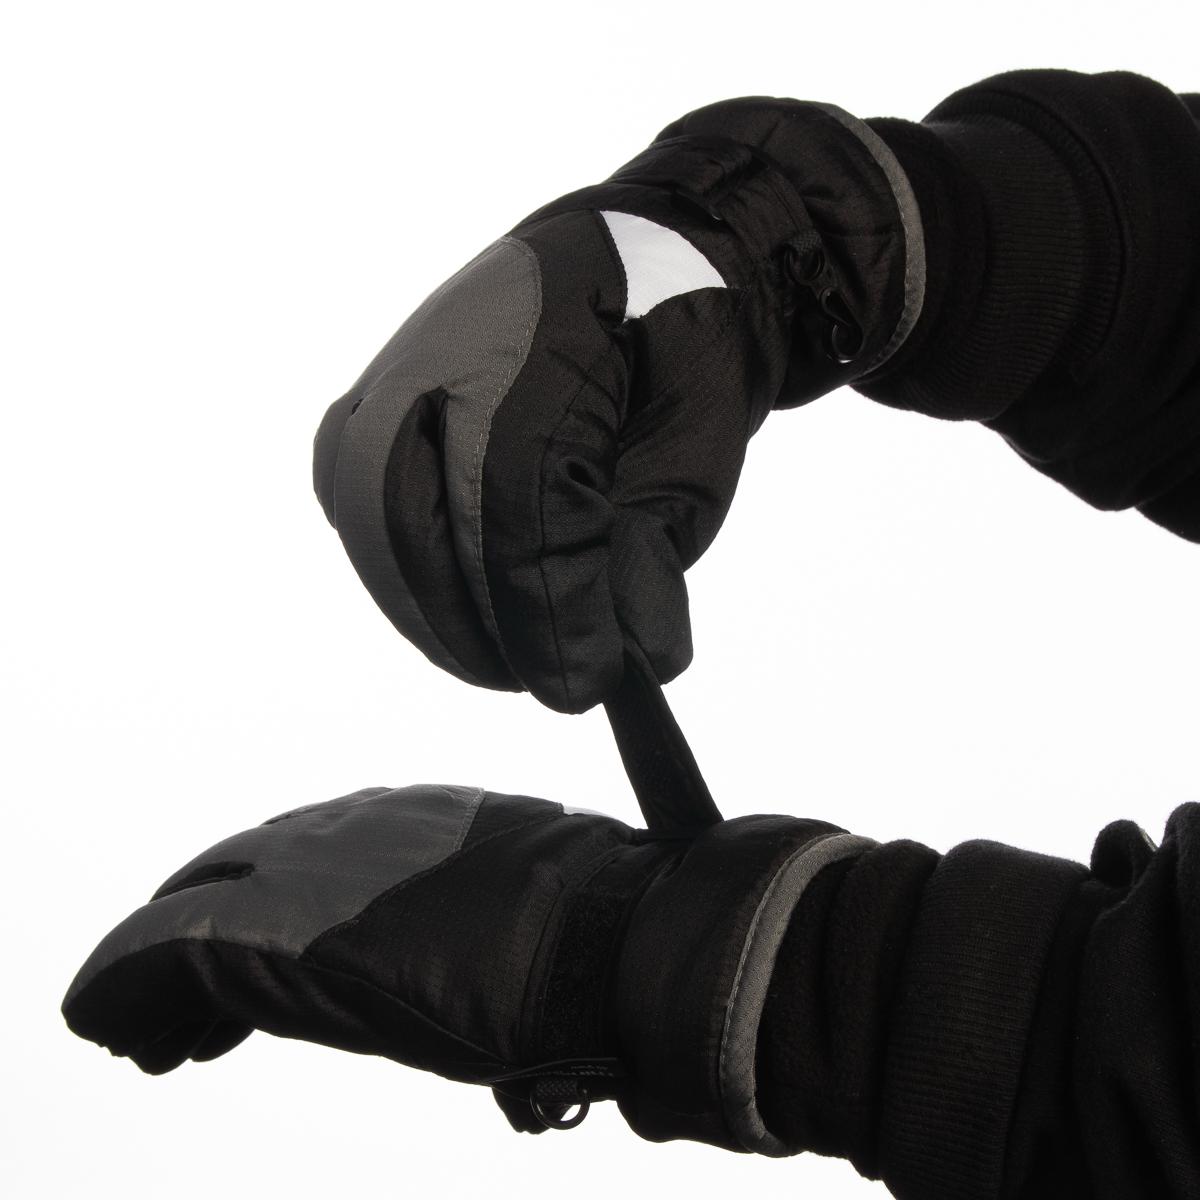 Statements-3-M-Thinsulate-Boy-s-Winter-Cold-Weather-Warm-Fleece-Lined-Ski-Gloves